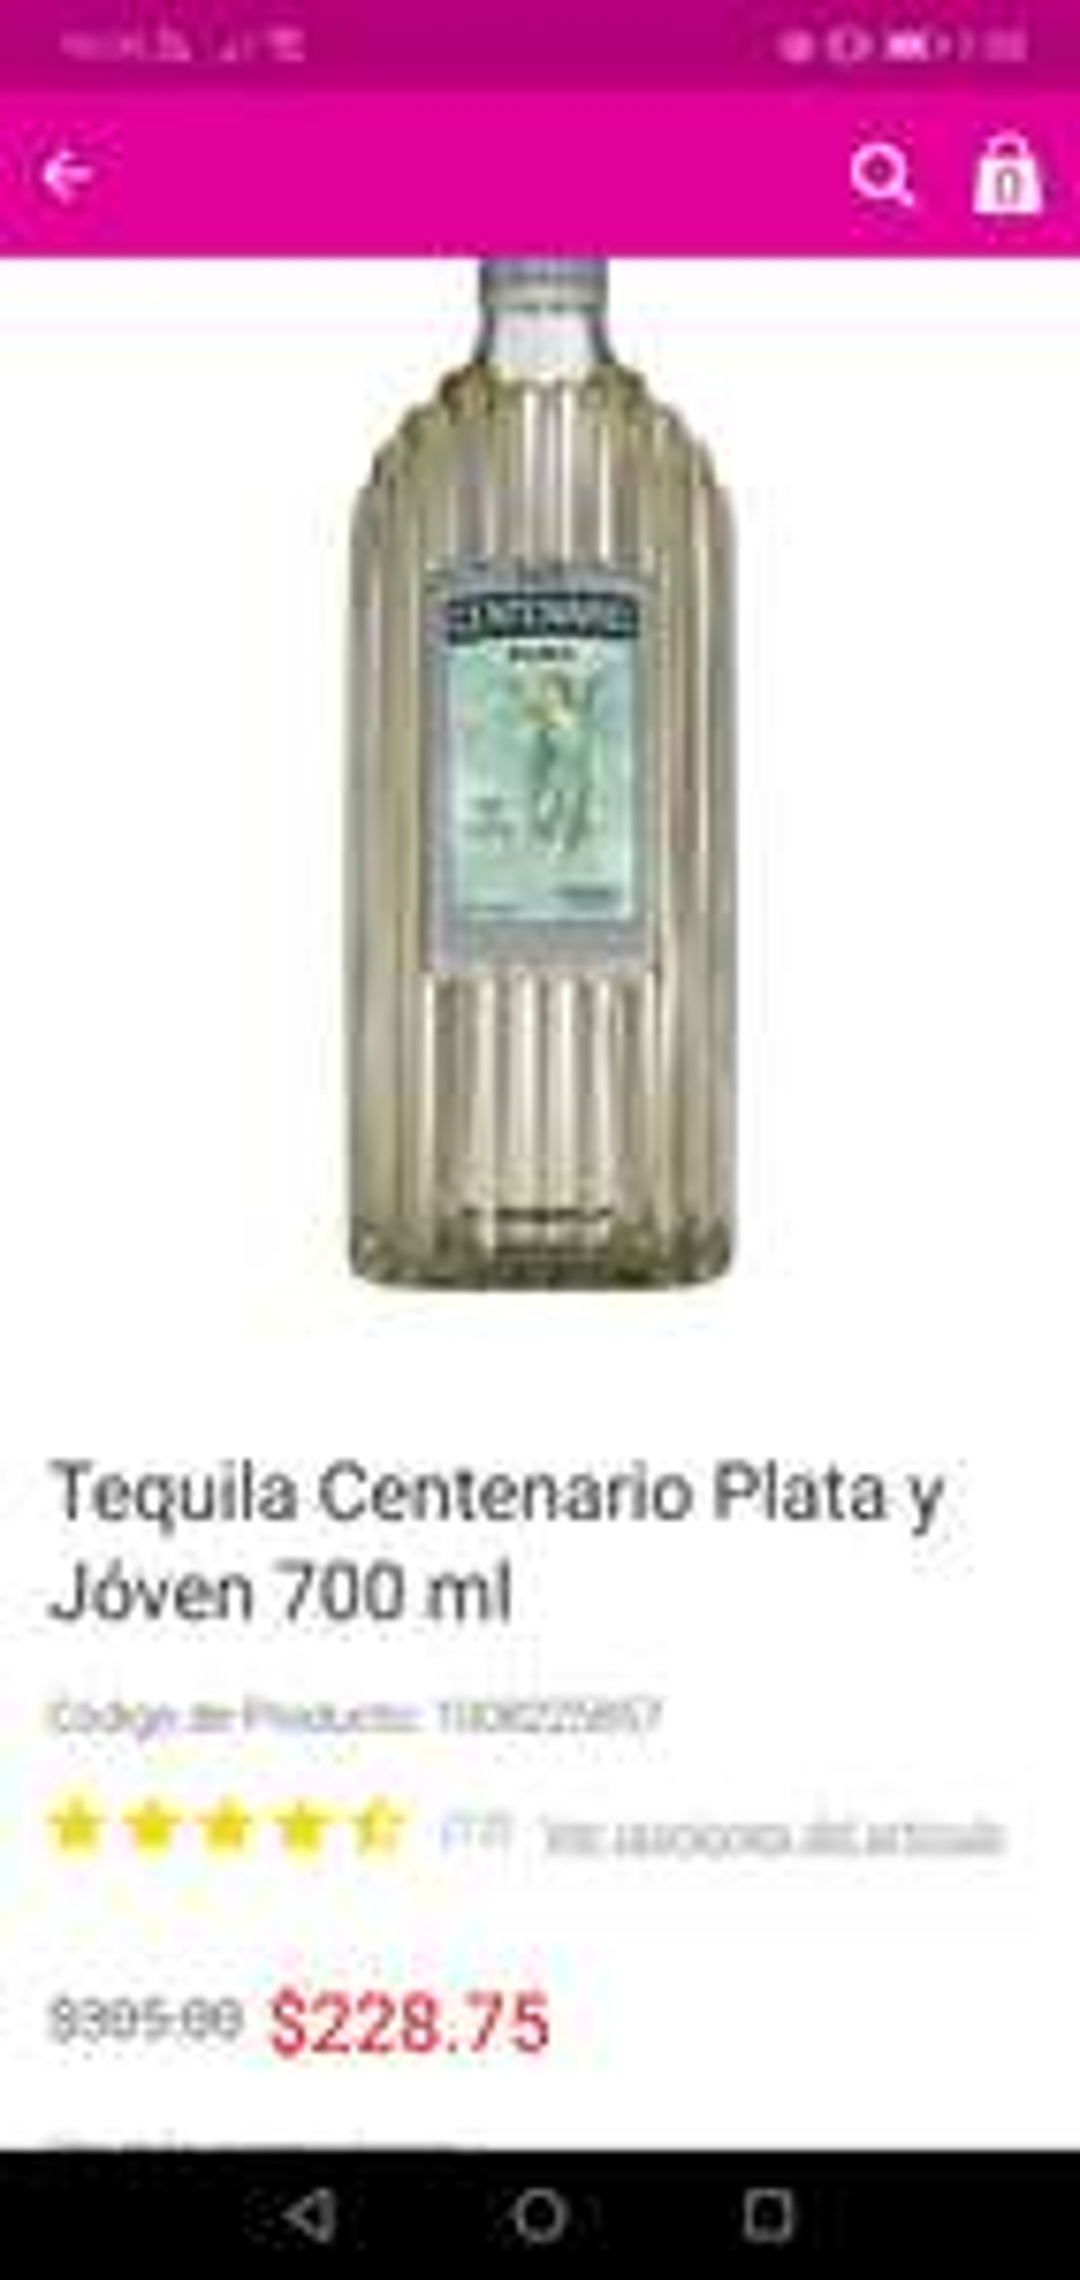 Liverpool: Tequila centenario plata $217